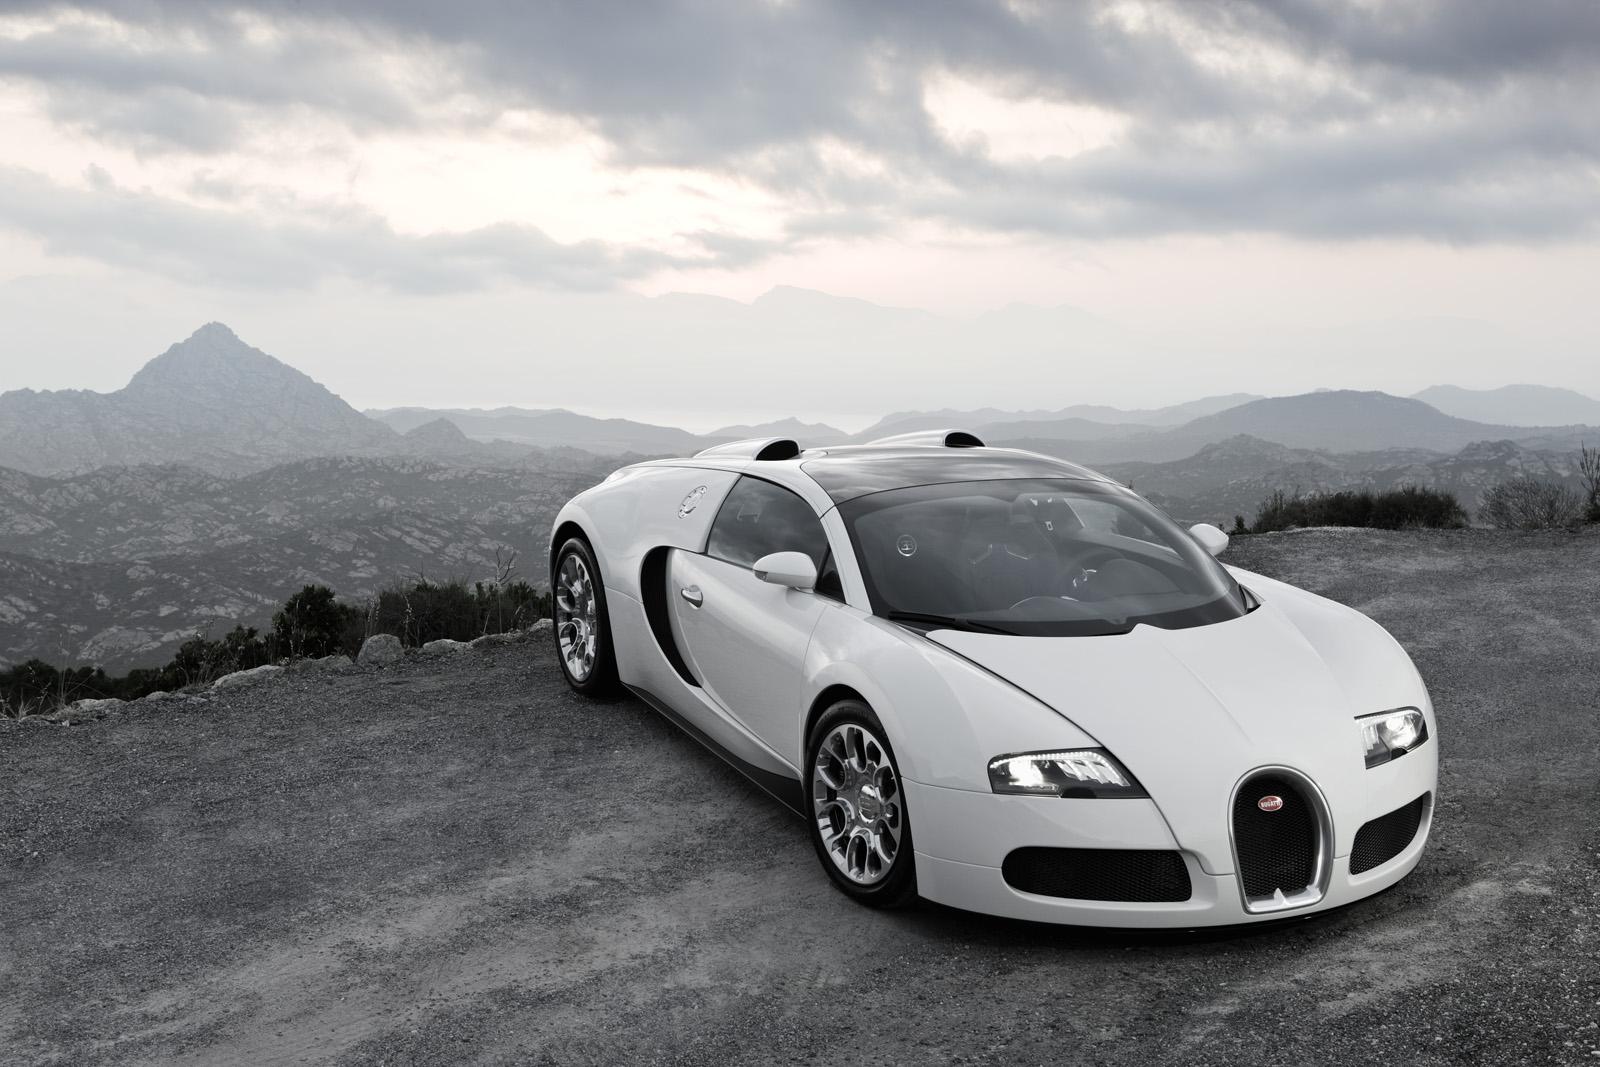 car Bugatti Veyron vs McLaren F1 Top Gear Free Picture Download Image Of